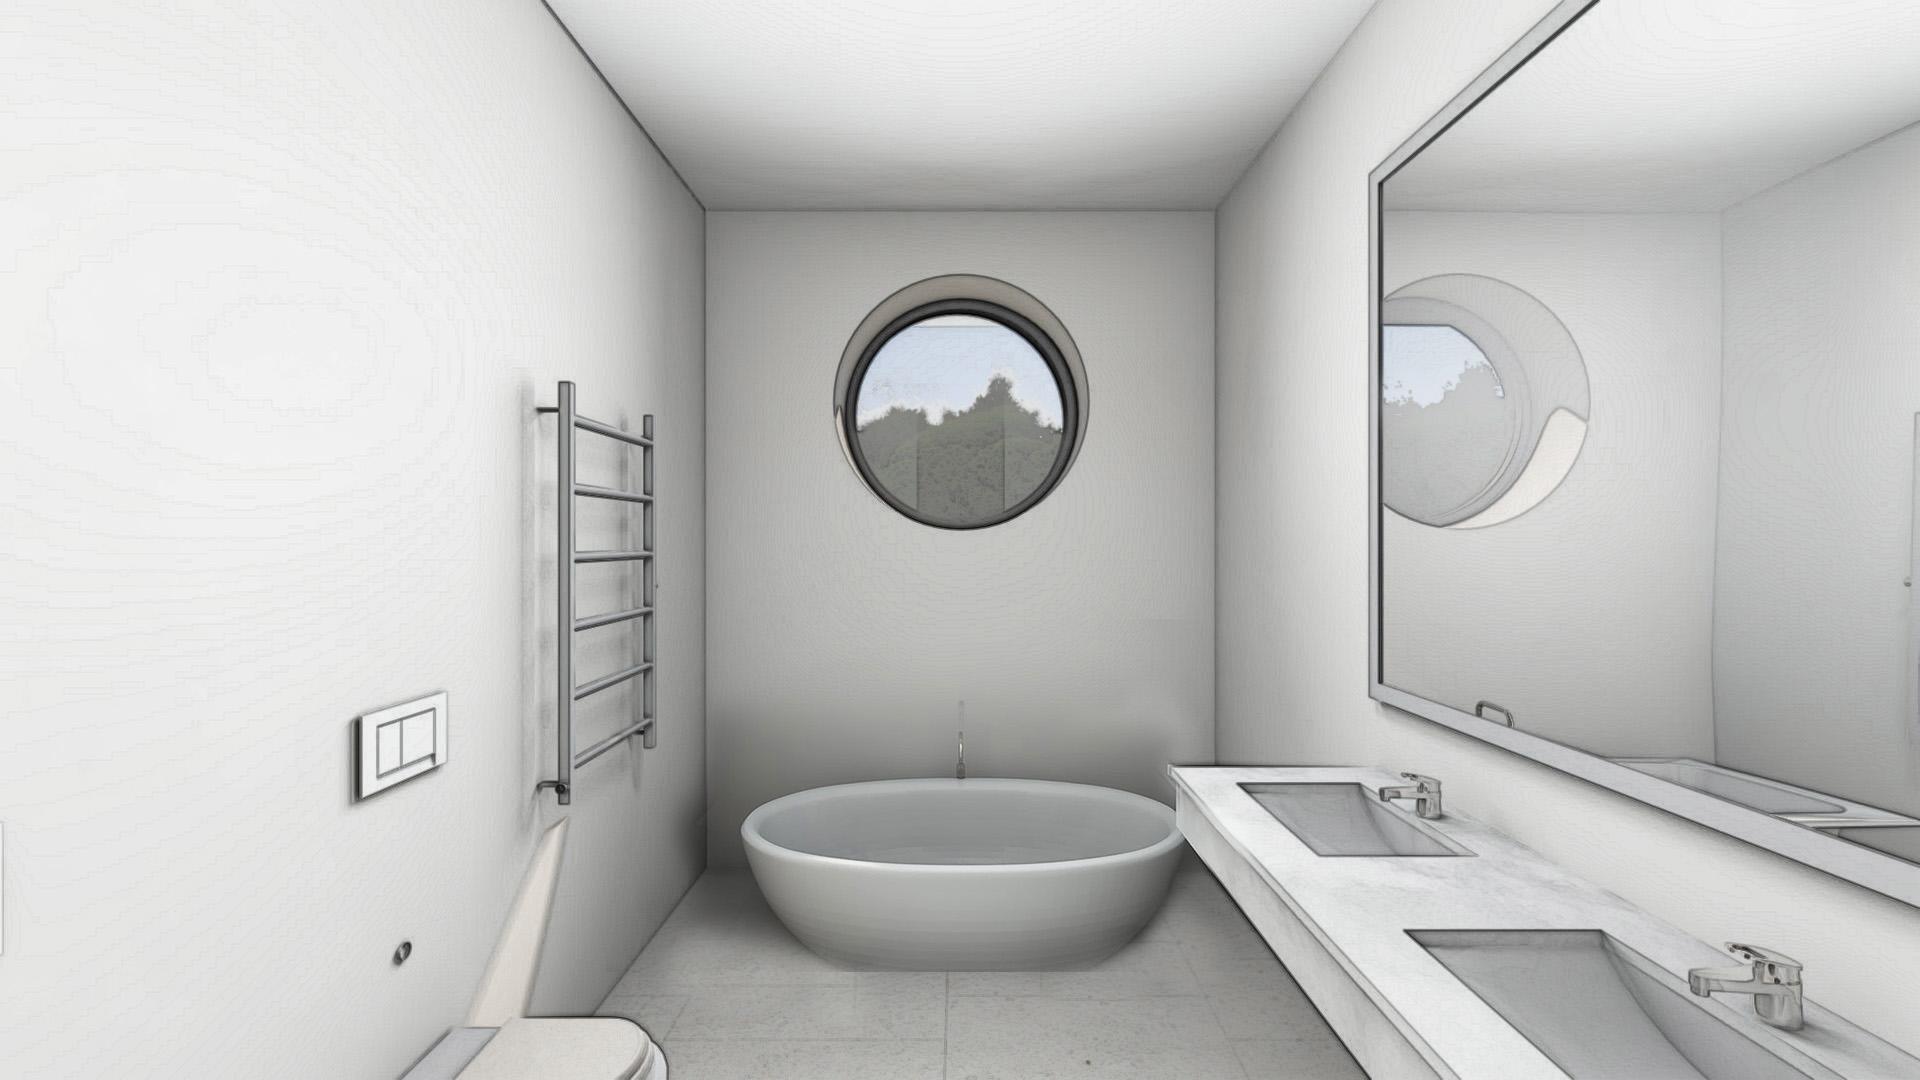 Изображение для проекта Проект особняка в Латвии в стиле модерн 2901